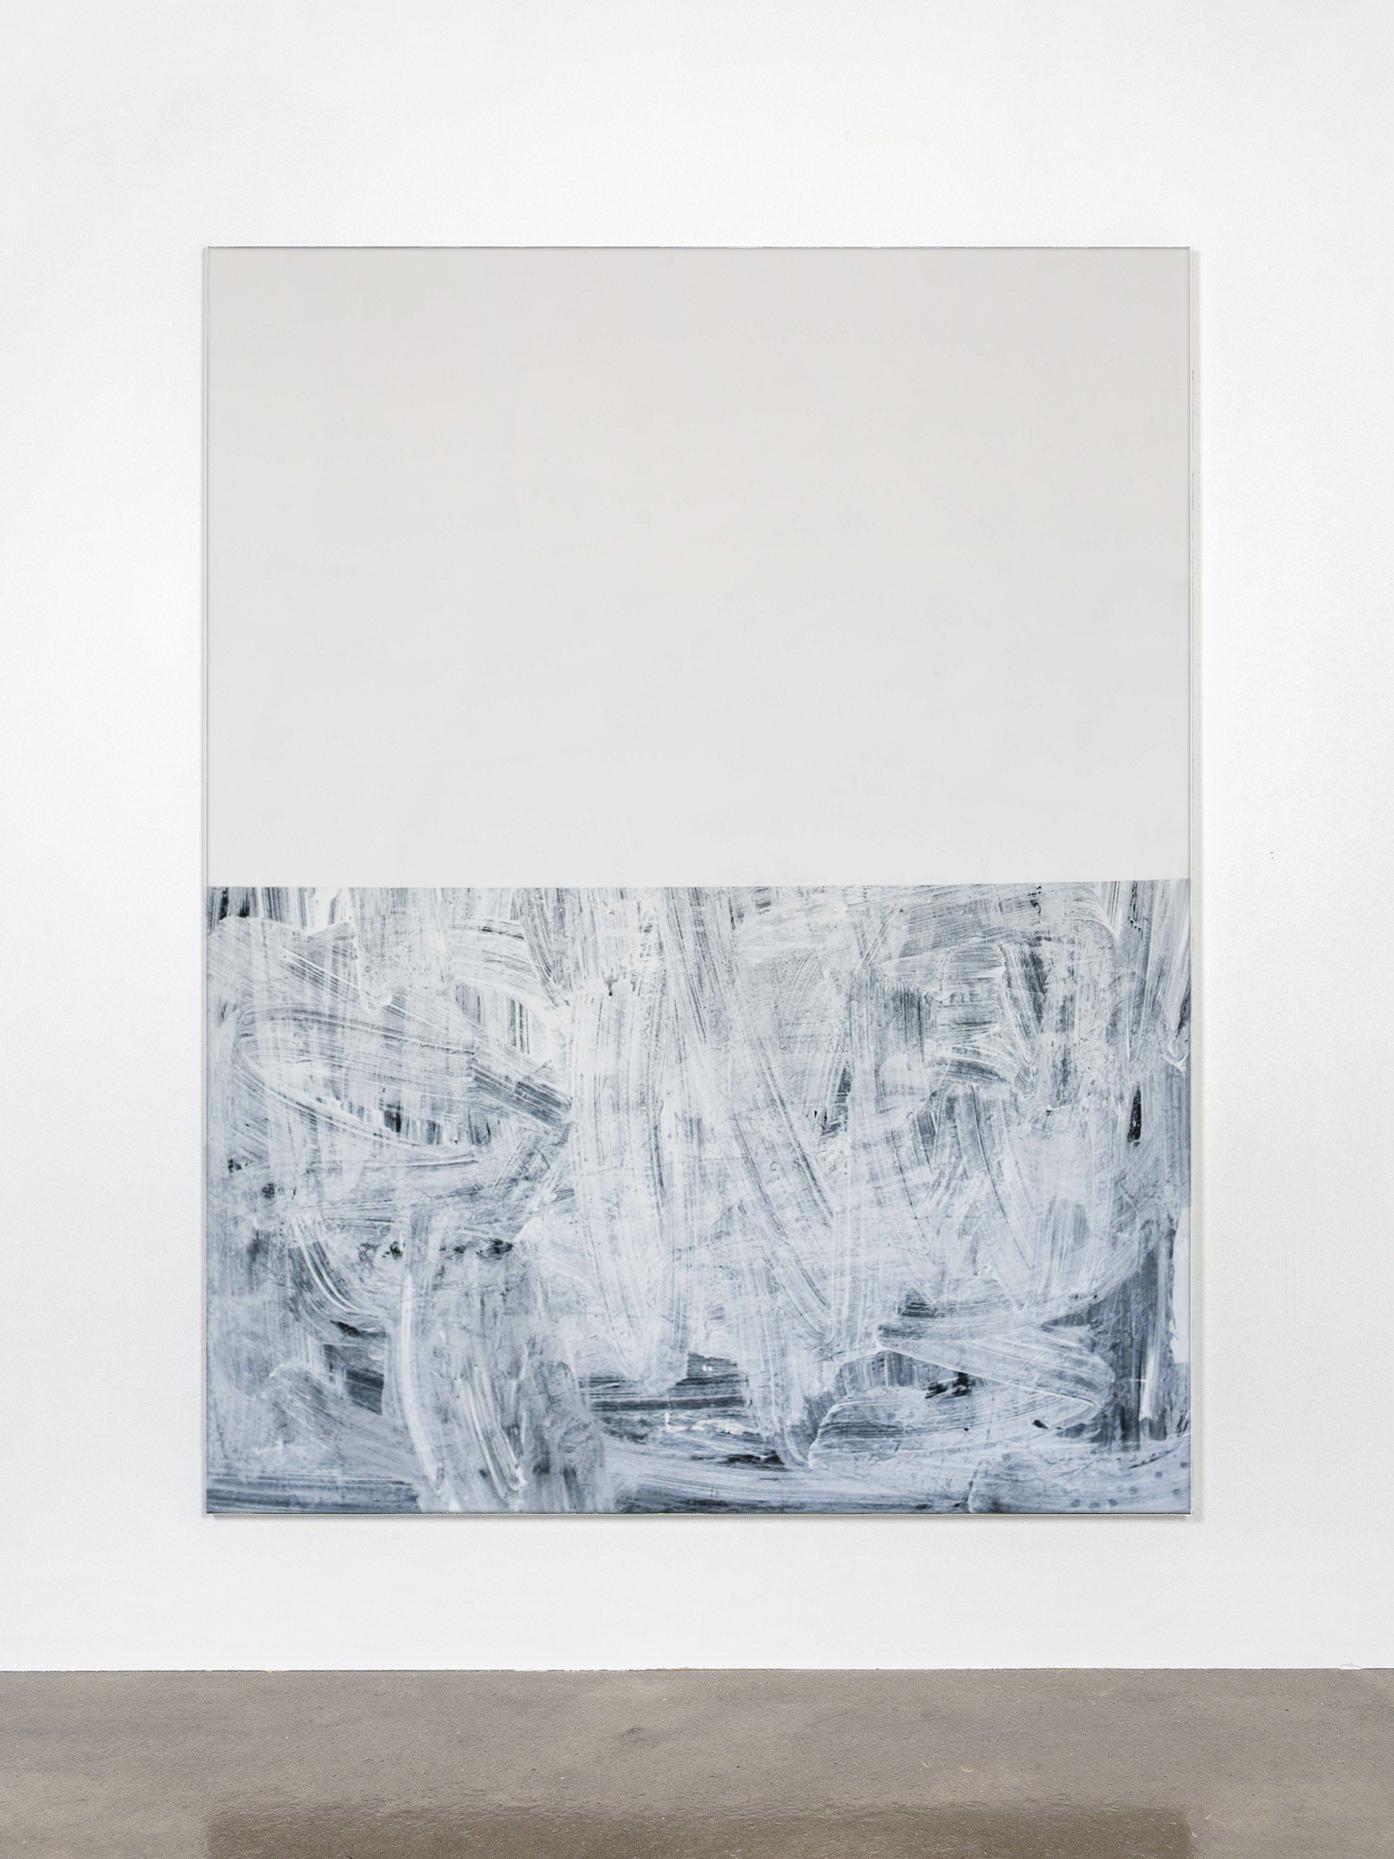 Reuben Beren James, Artwork, Dog was a